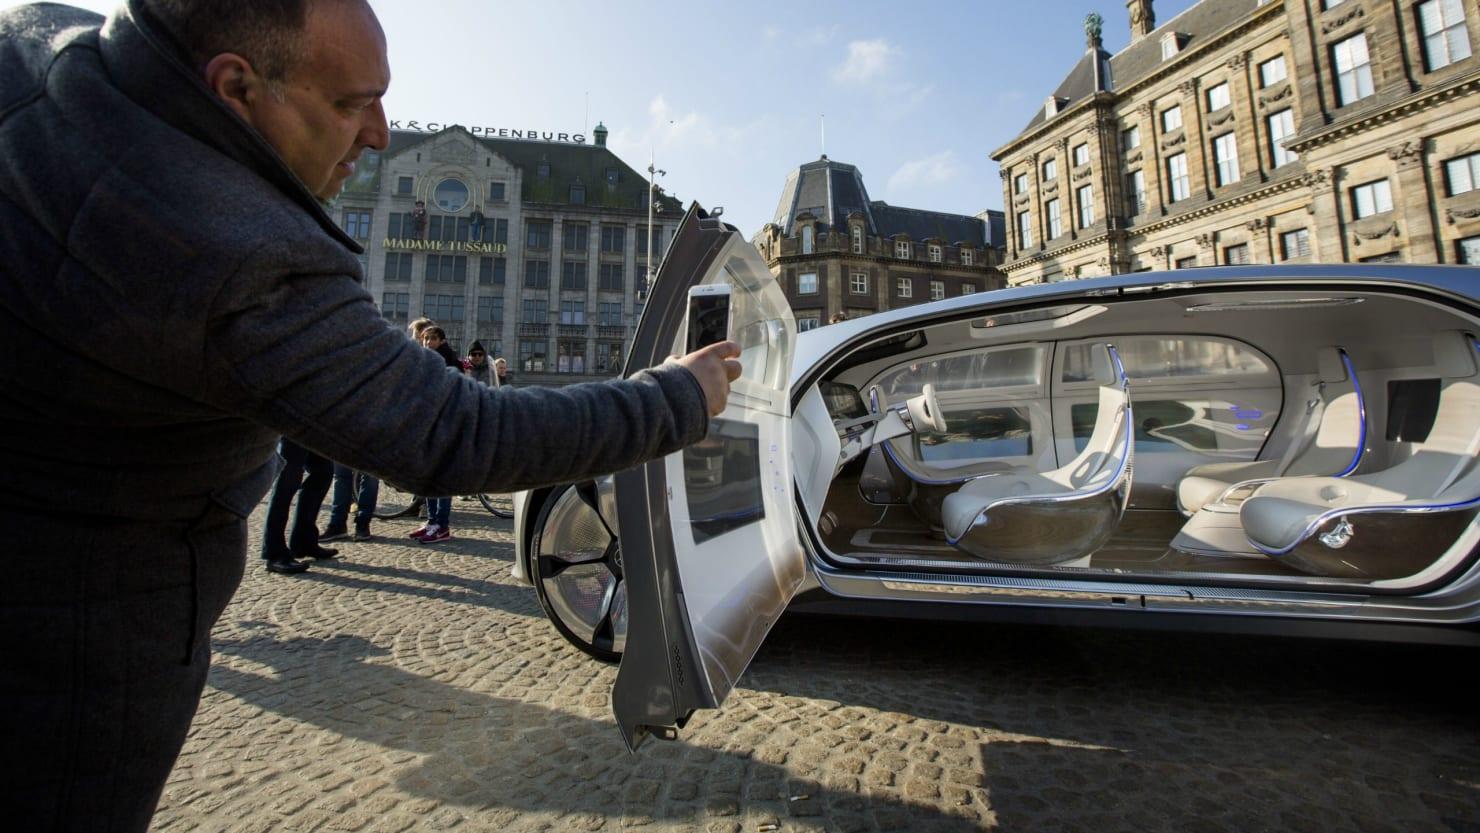 Autonomous Vehicles Could Lead to Rise in Car Sex: Study